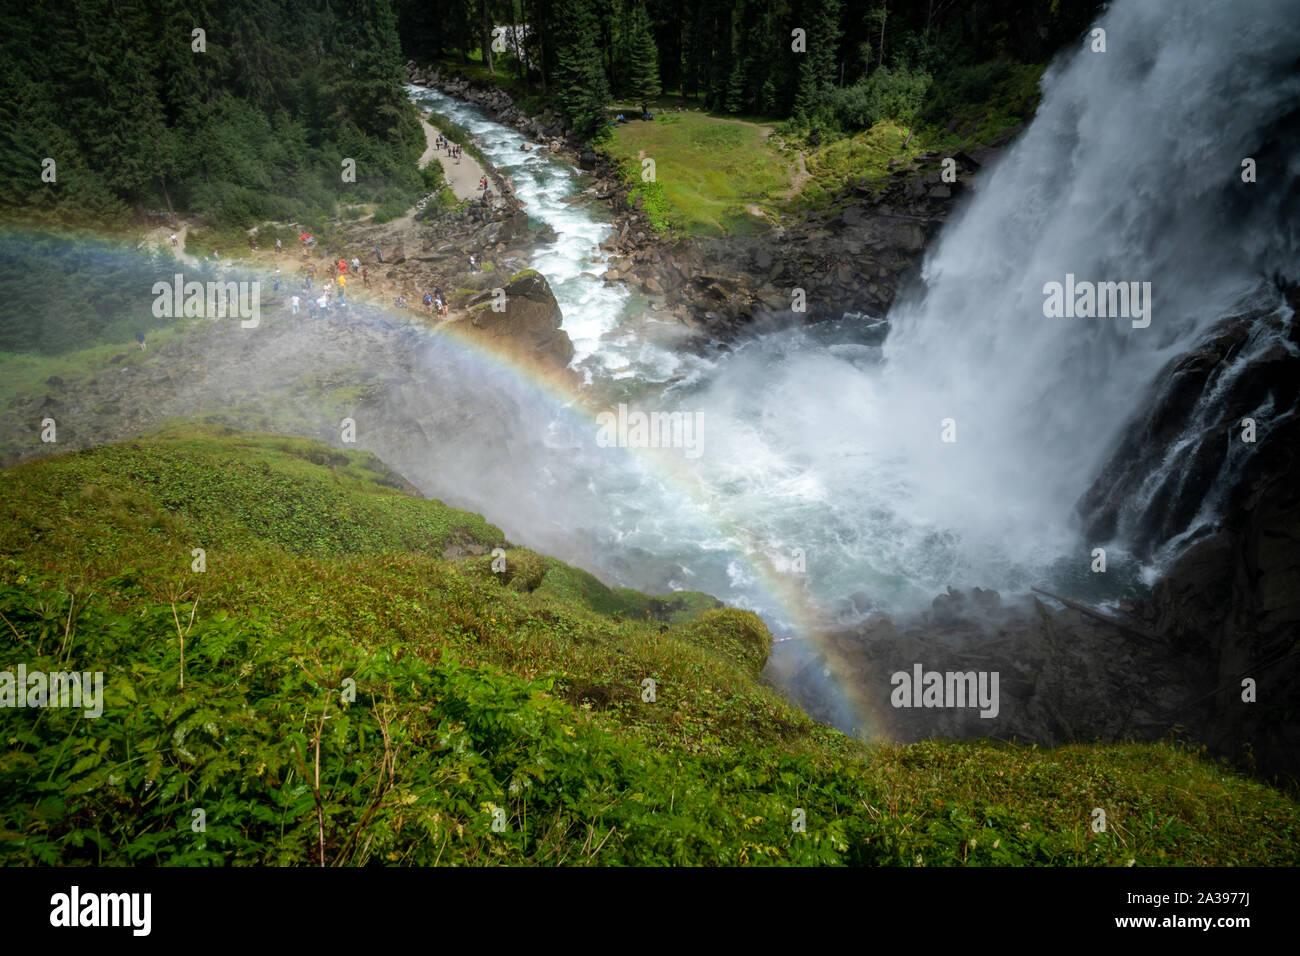 Rainbow over Krimml Waterfalls, High Tauern National Park, Salzburg, Austria Stock Photo